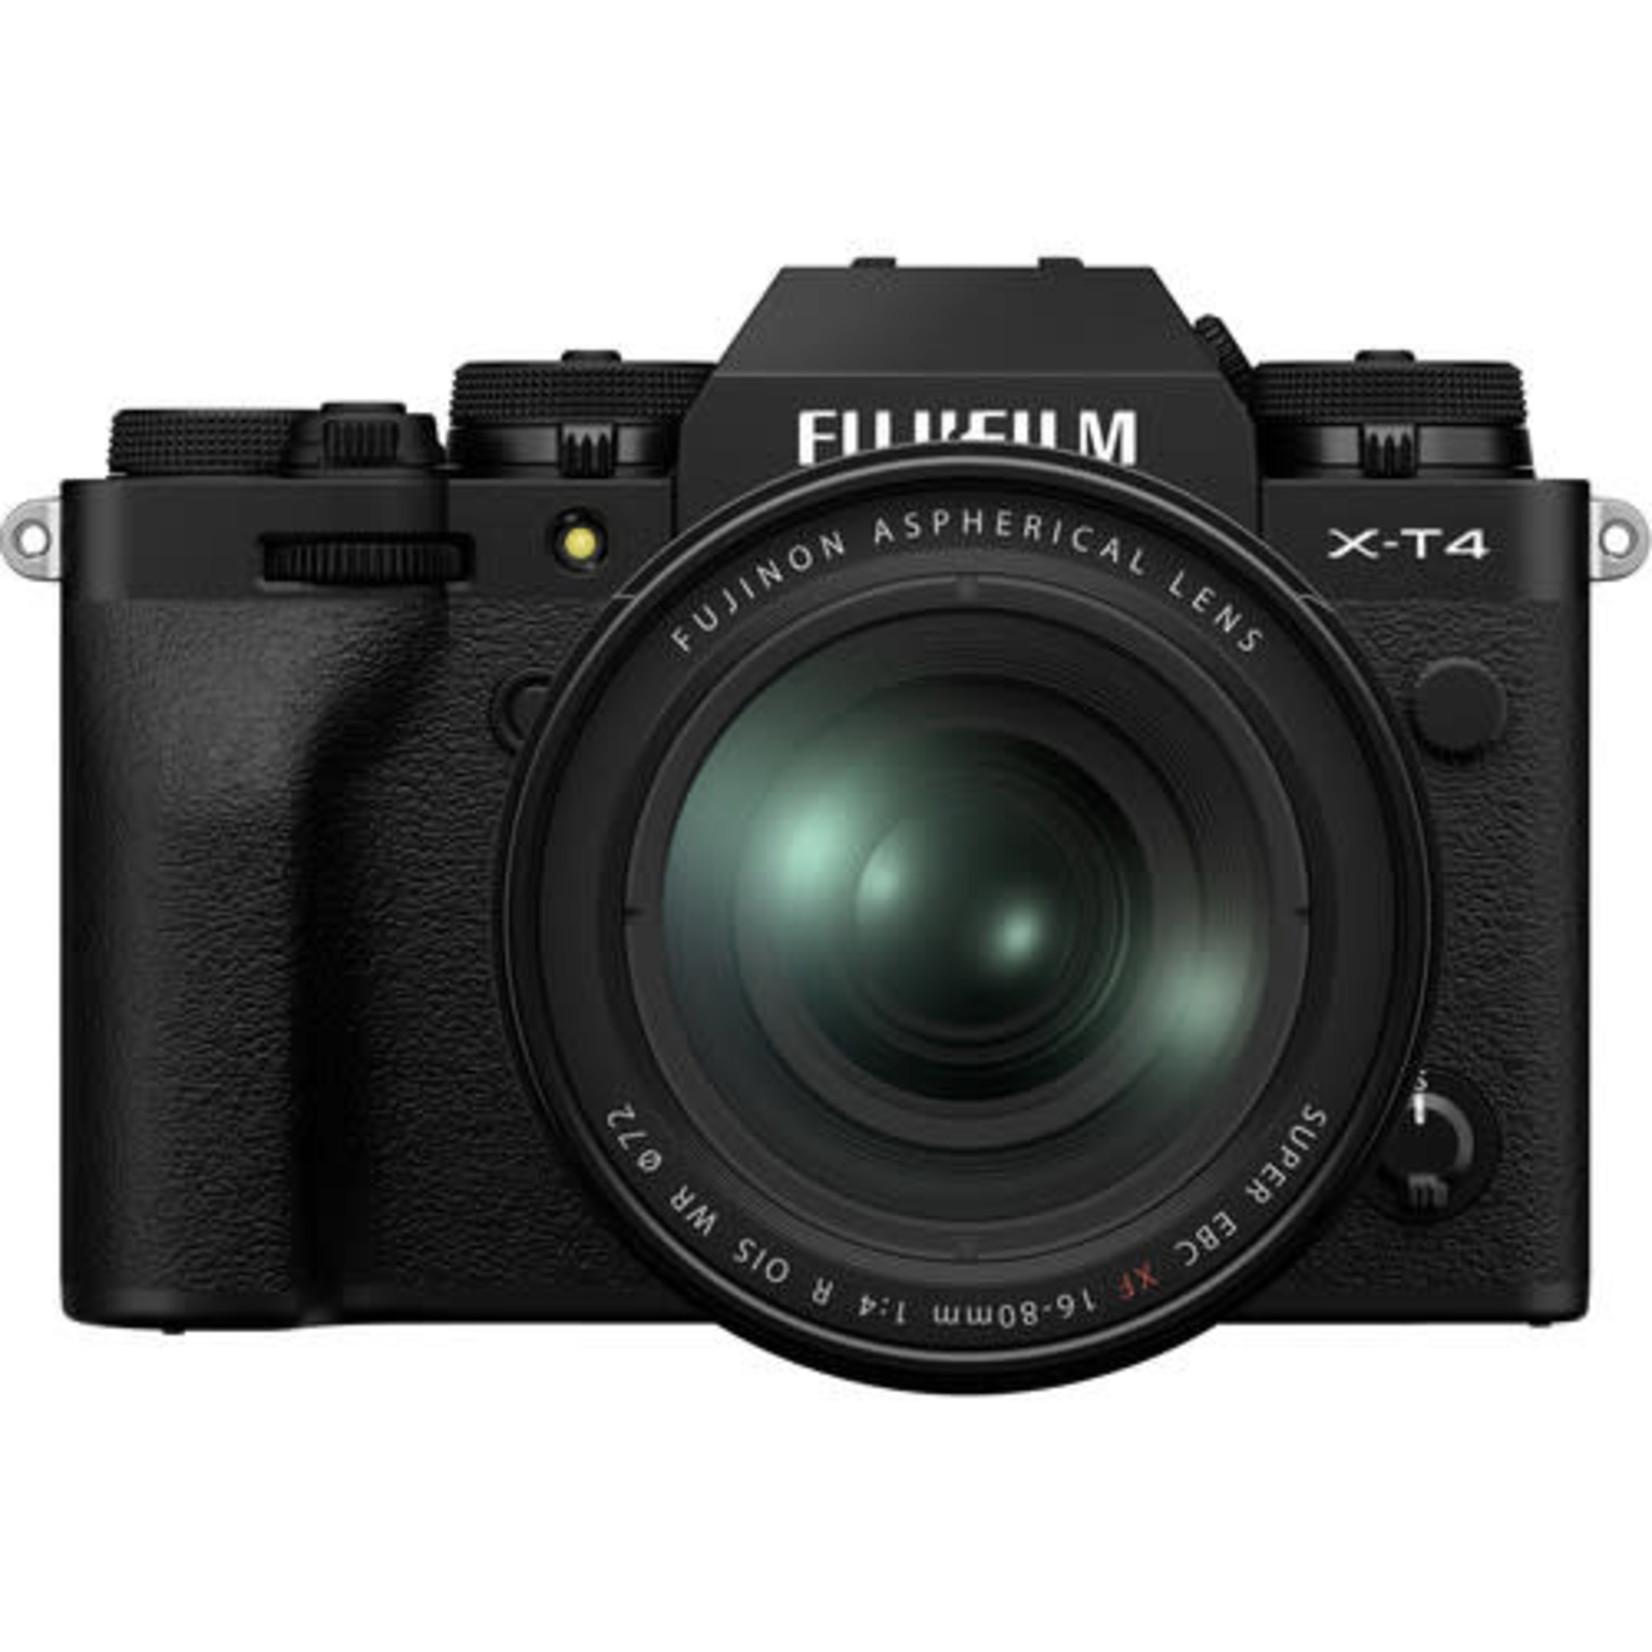 FujiFilm FUJIFILM X-T4 Mirrorless Digital Camera with 16-80mm Lens (Black)